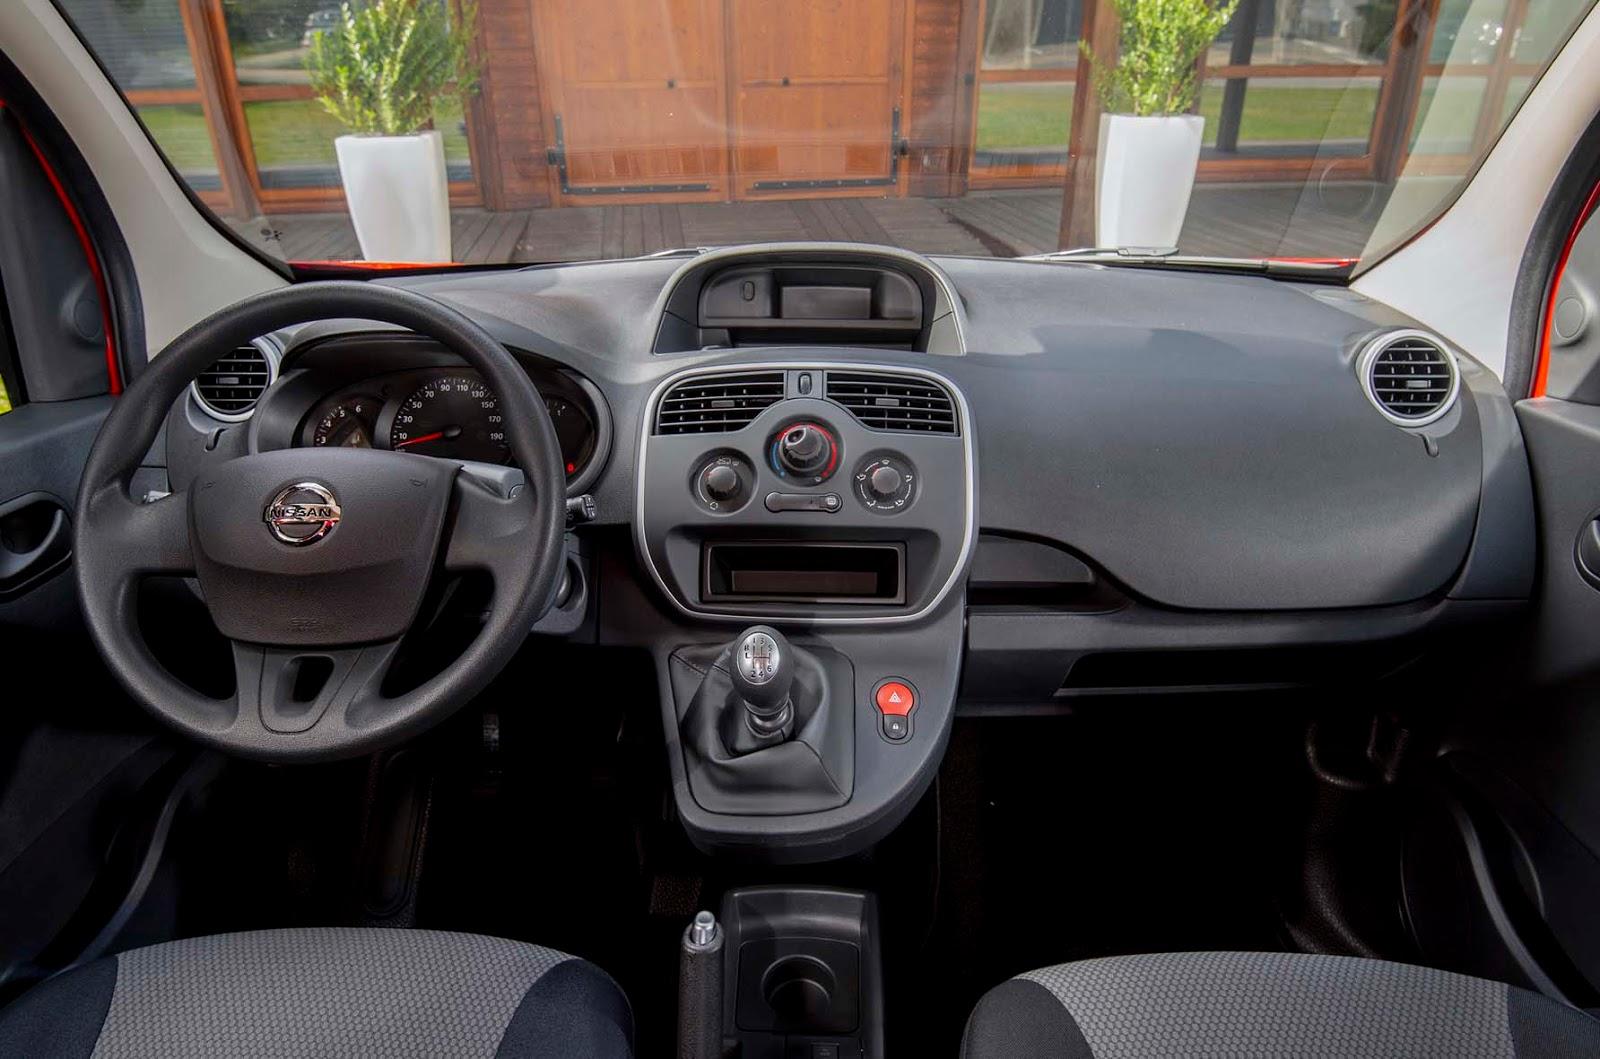 Nissan2BNV2502BL12BVan2B 2BRed2B 2BInterior2B1 Τον Σεπτέμβριο έρχεται το νέο Nissan NV250 Επαγγελματικά, καινούργιο, καινούρια, τιμες